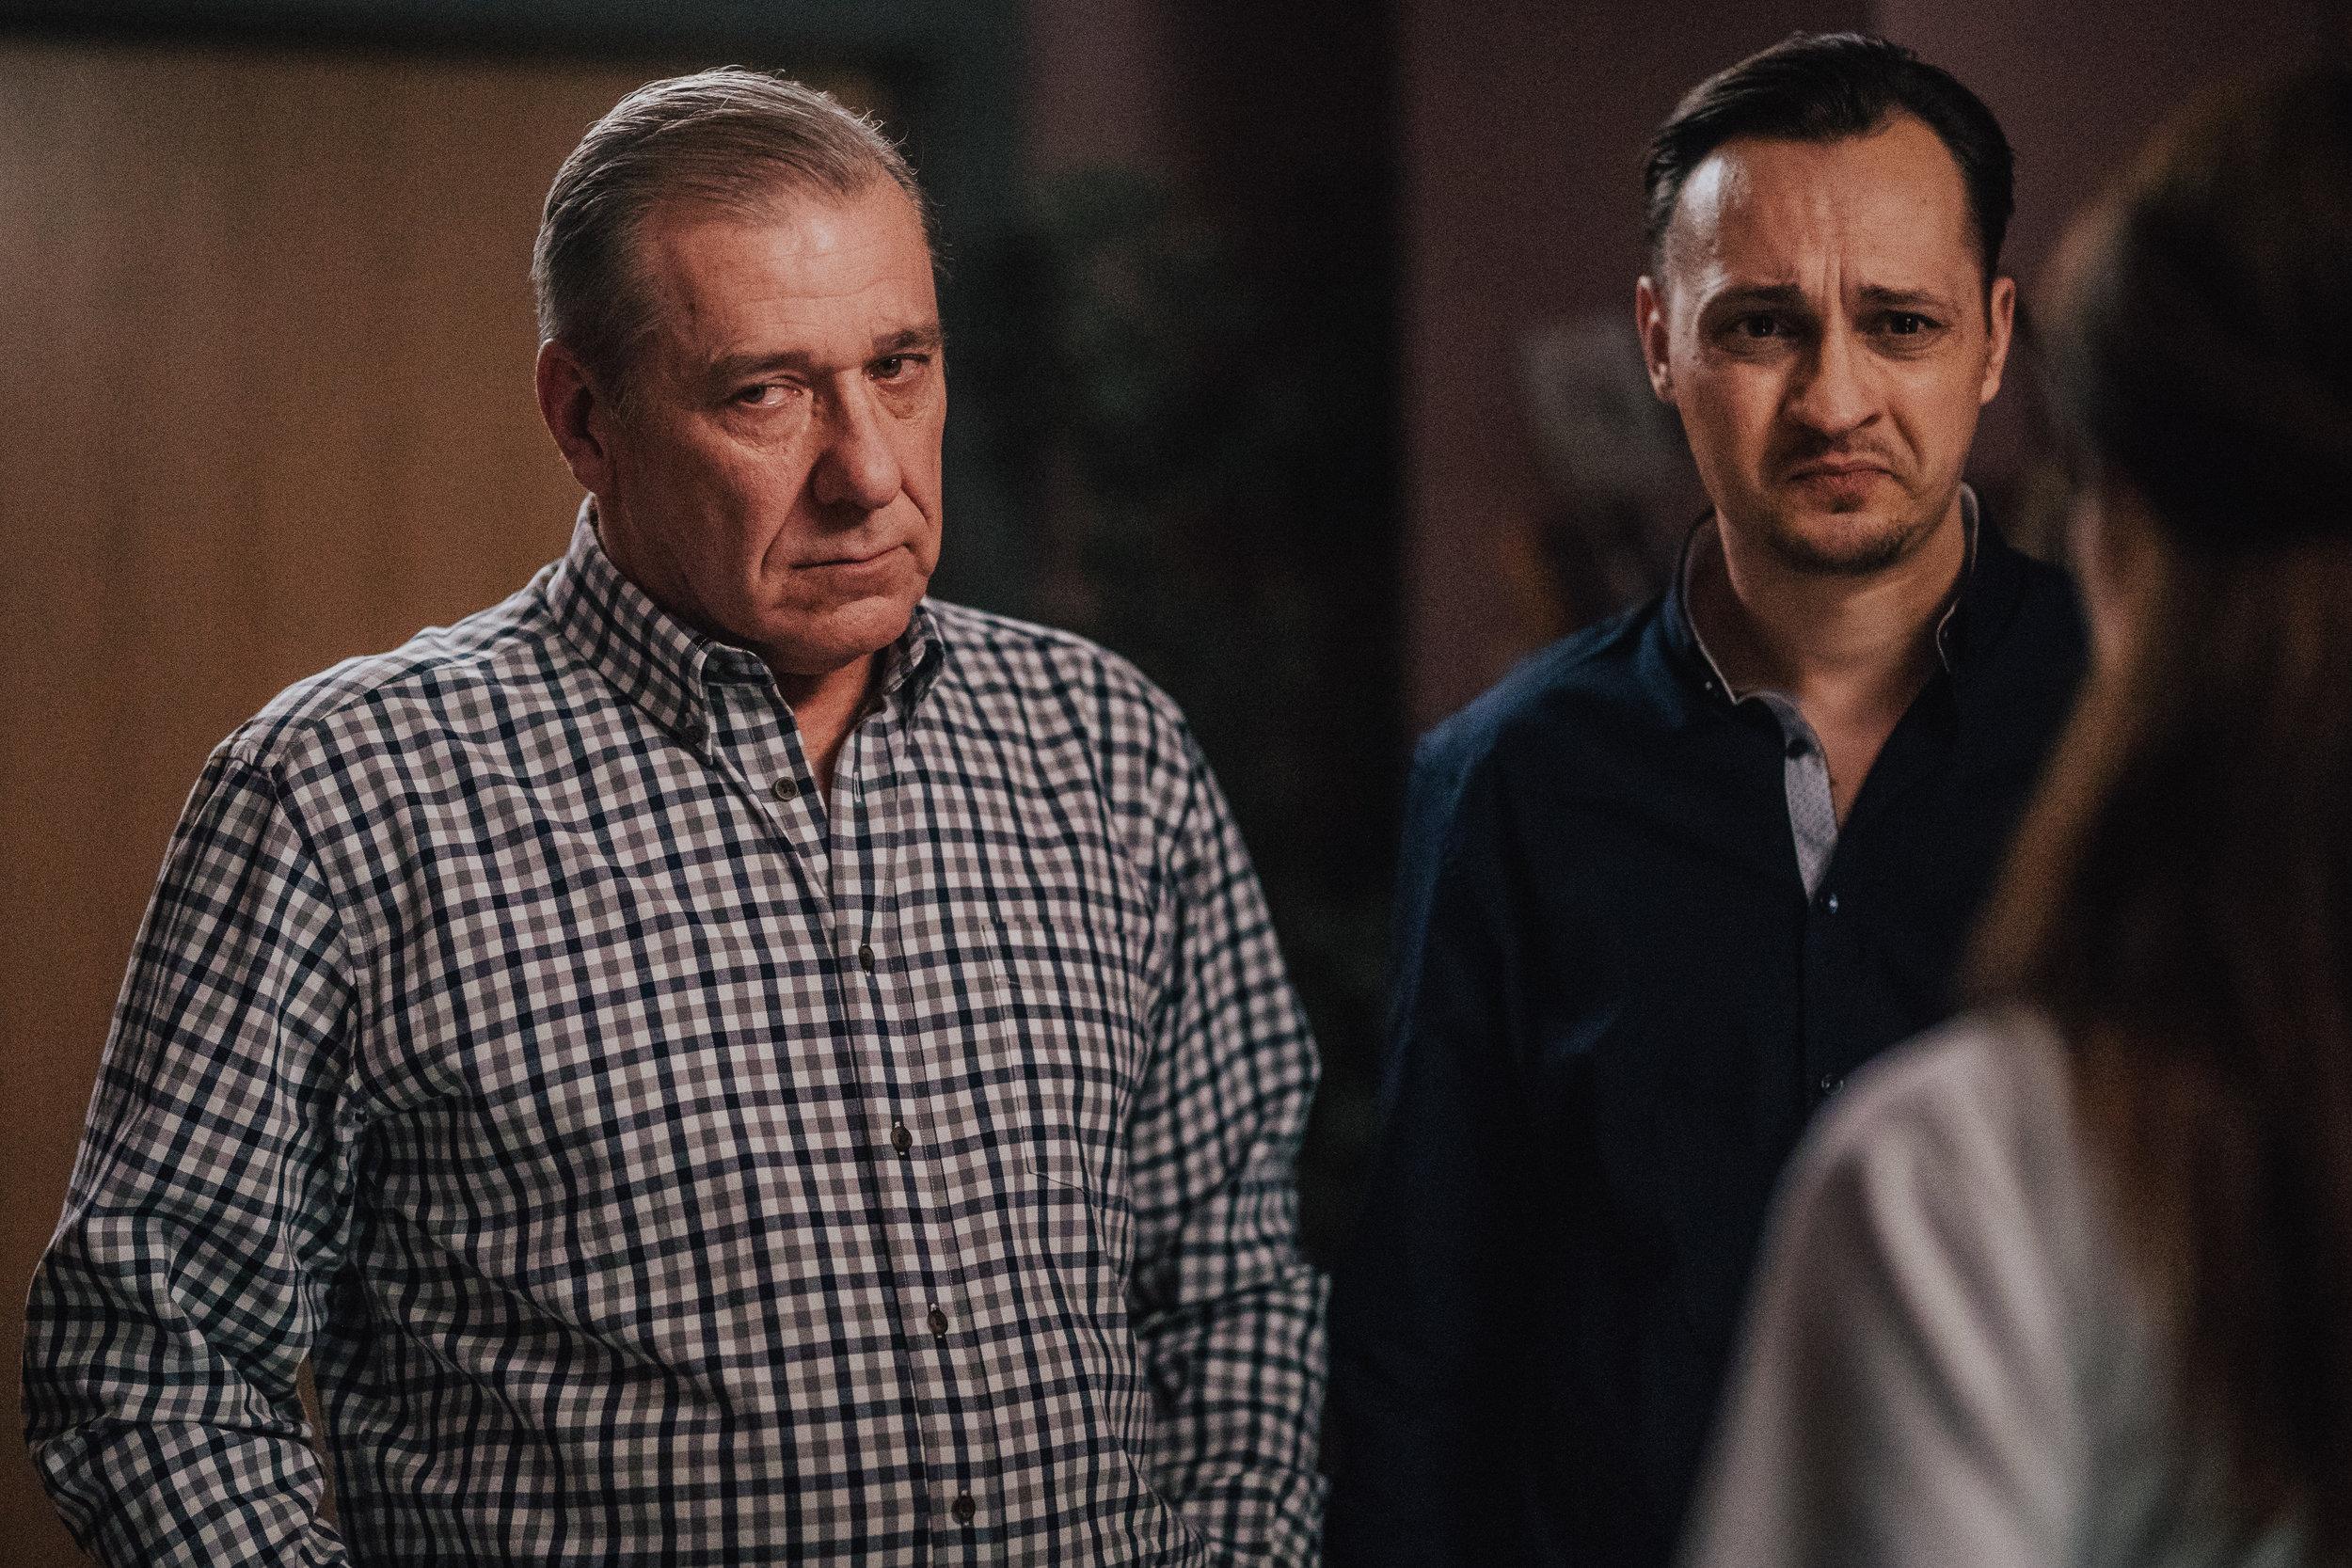 Ales Valic (Uros Lekic) and Blaz Setnikar (Jan)